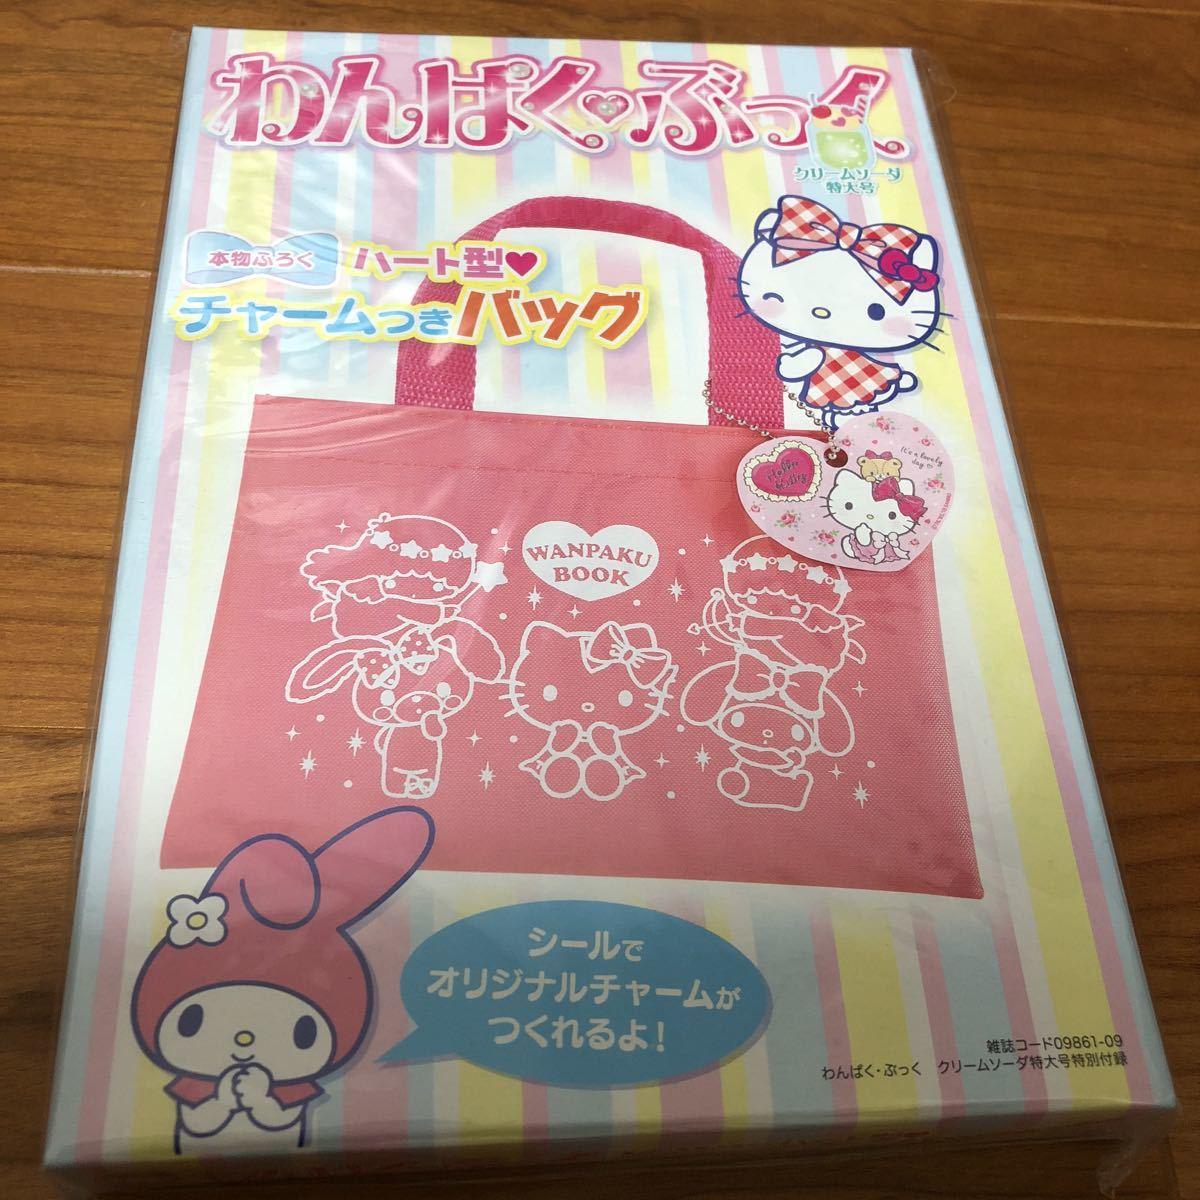 Description. F S With charm Back Sanrio Kikirara Hello Kitty MyMelo New Tote  bag ... 1744297a51721